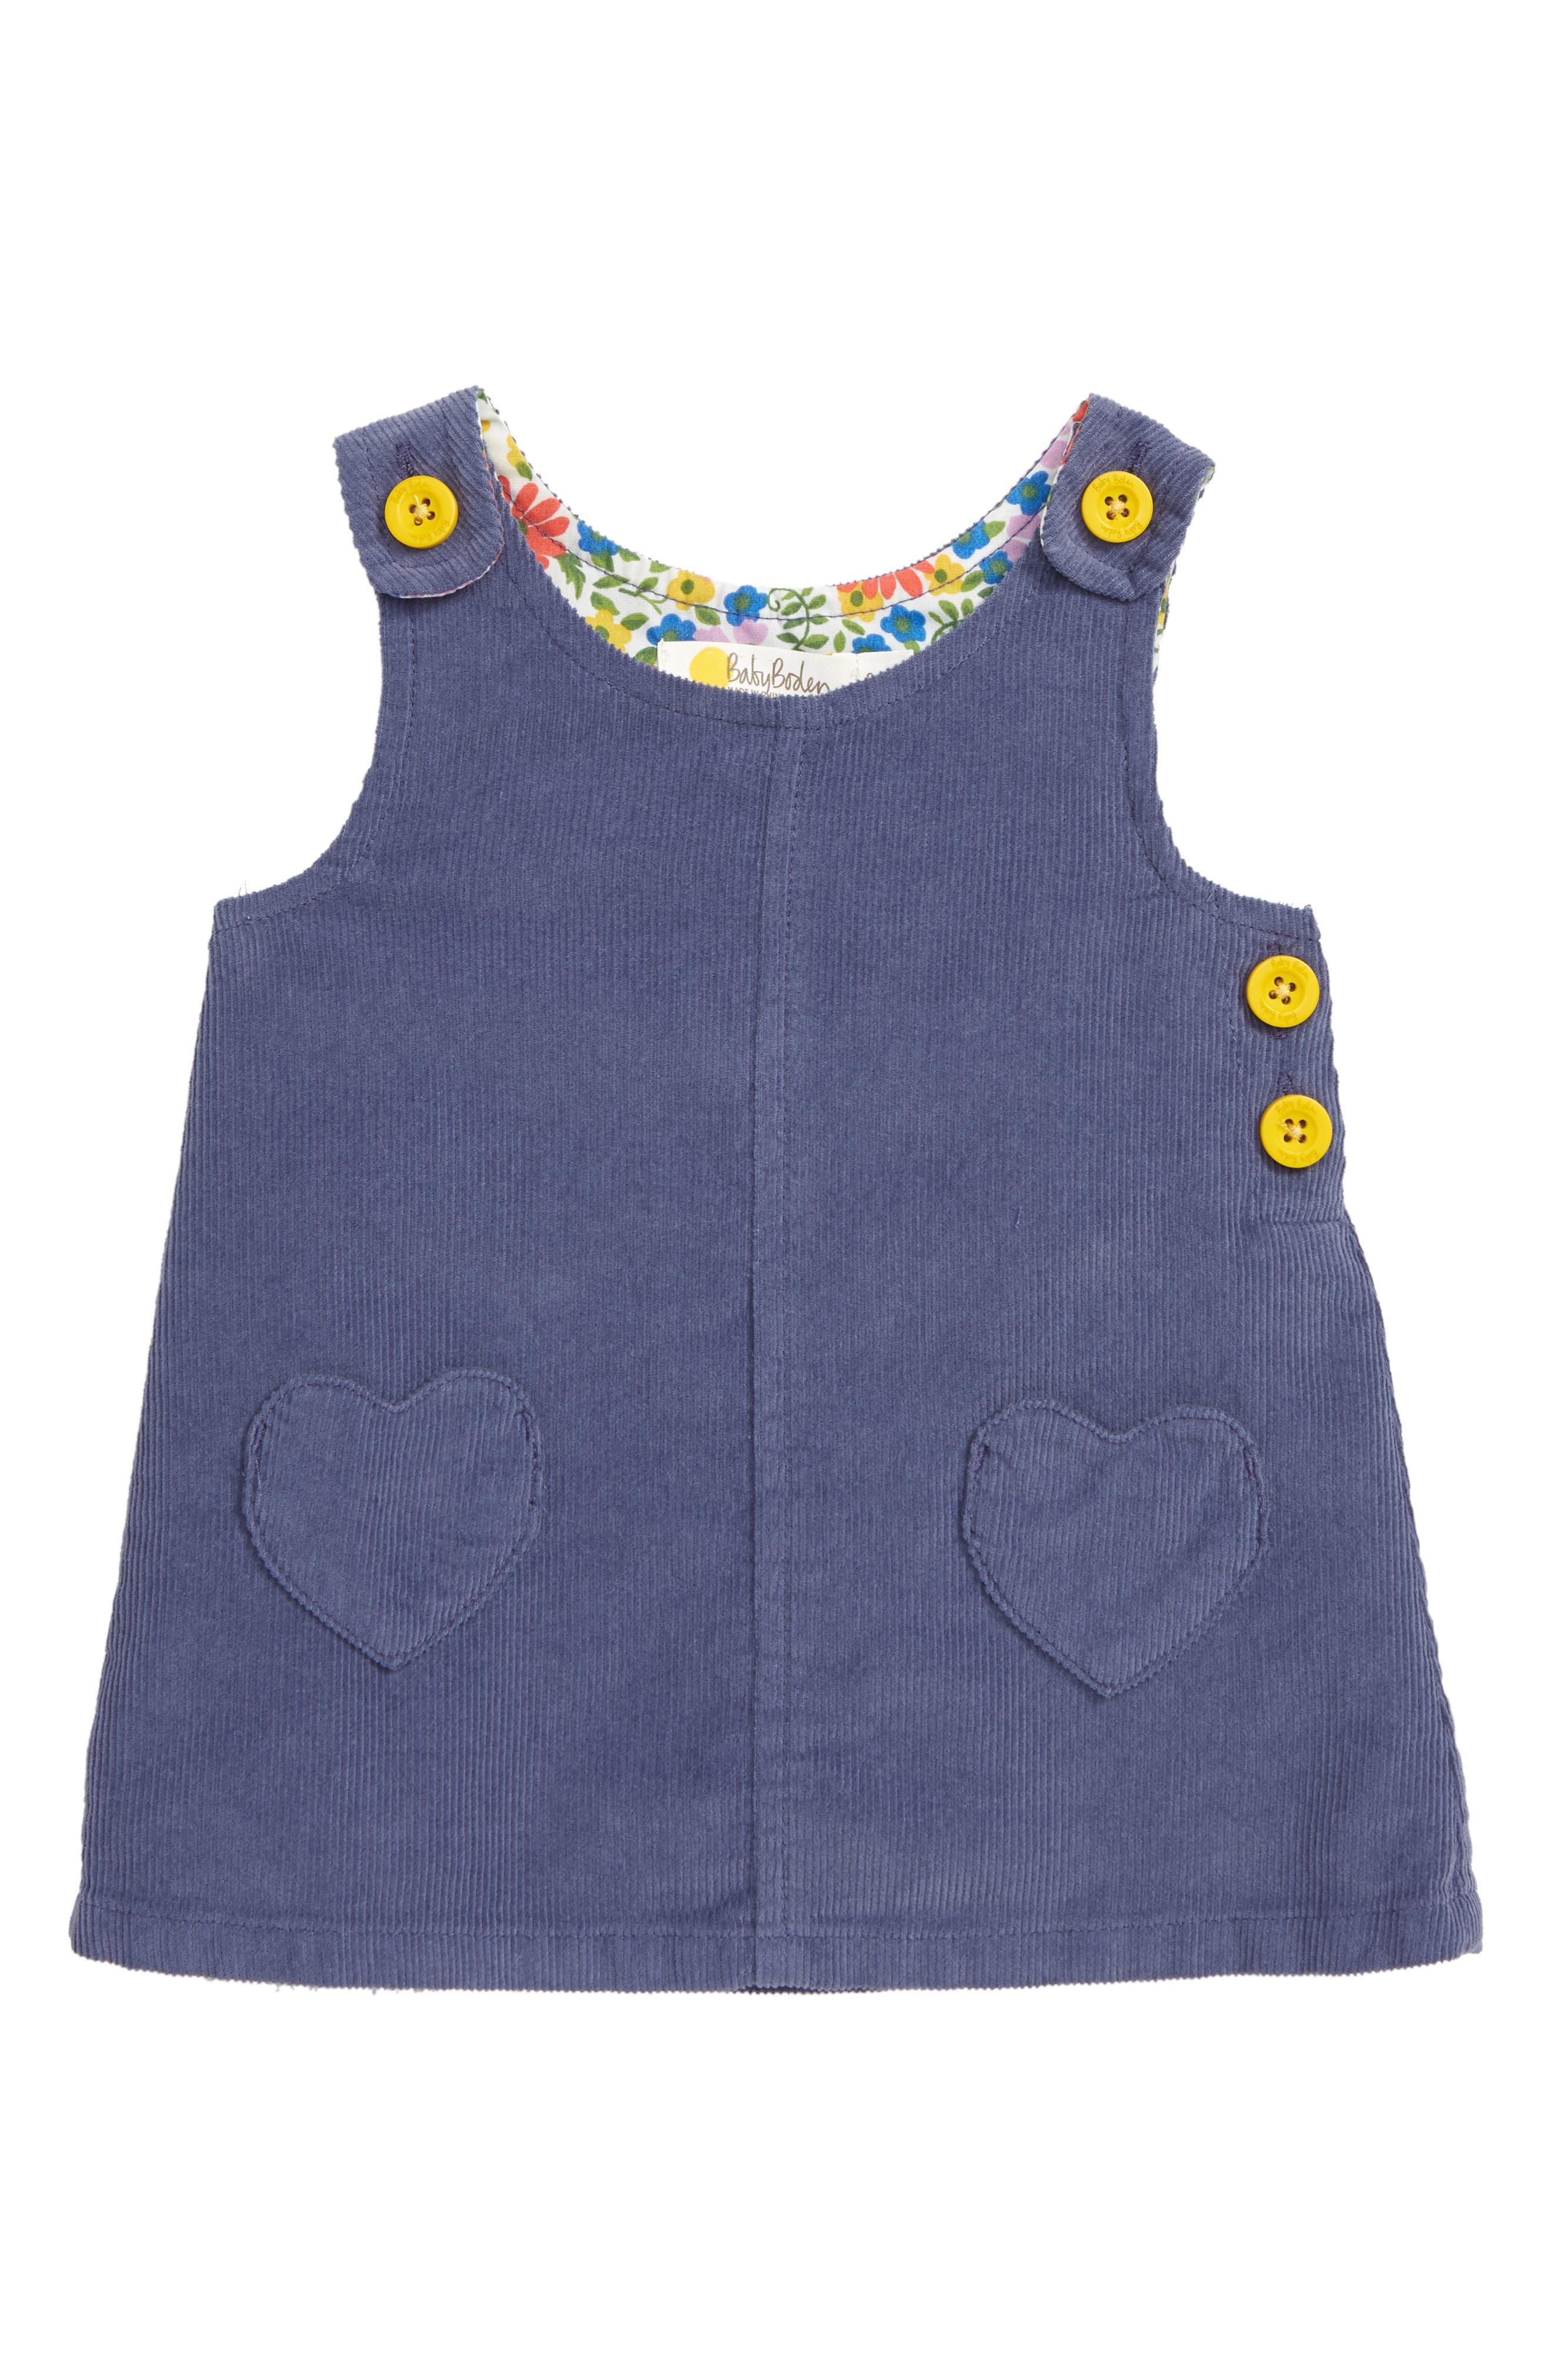 MINI BODEN Patch Pocket Corduroy Dress, Main, color, PRP VIOLET GREY